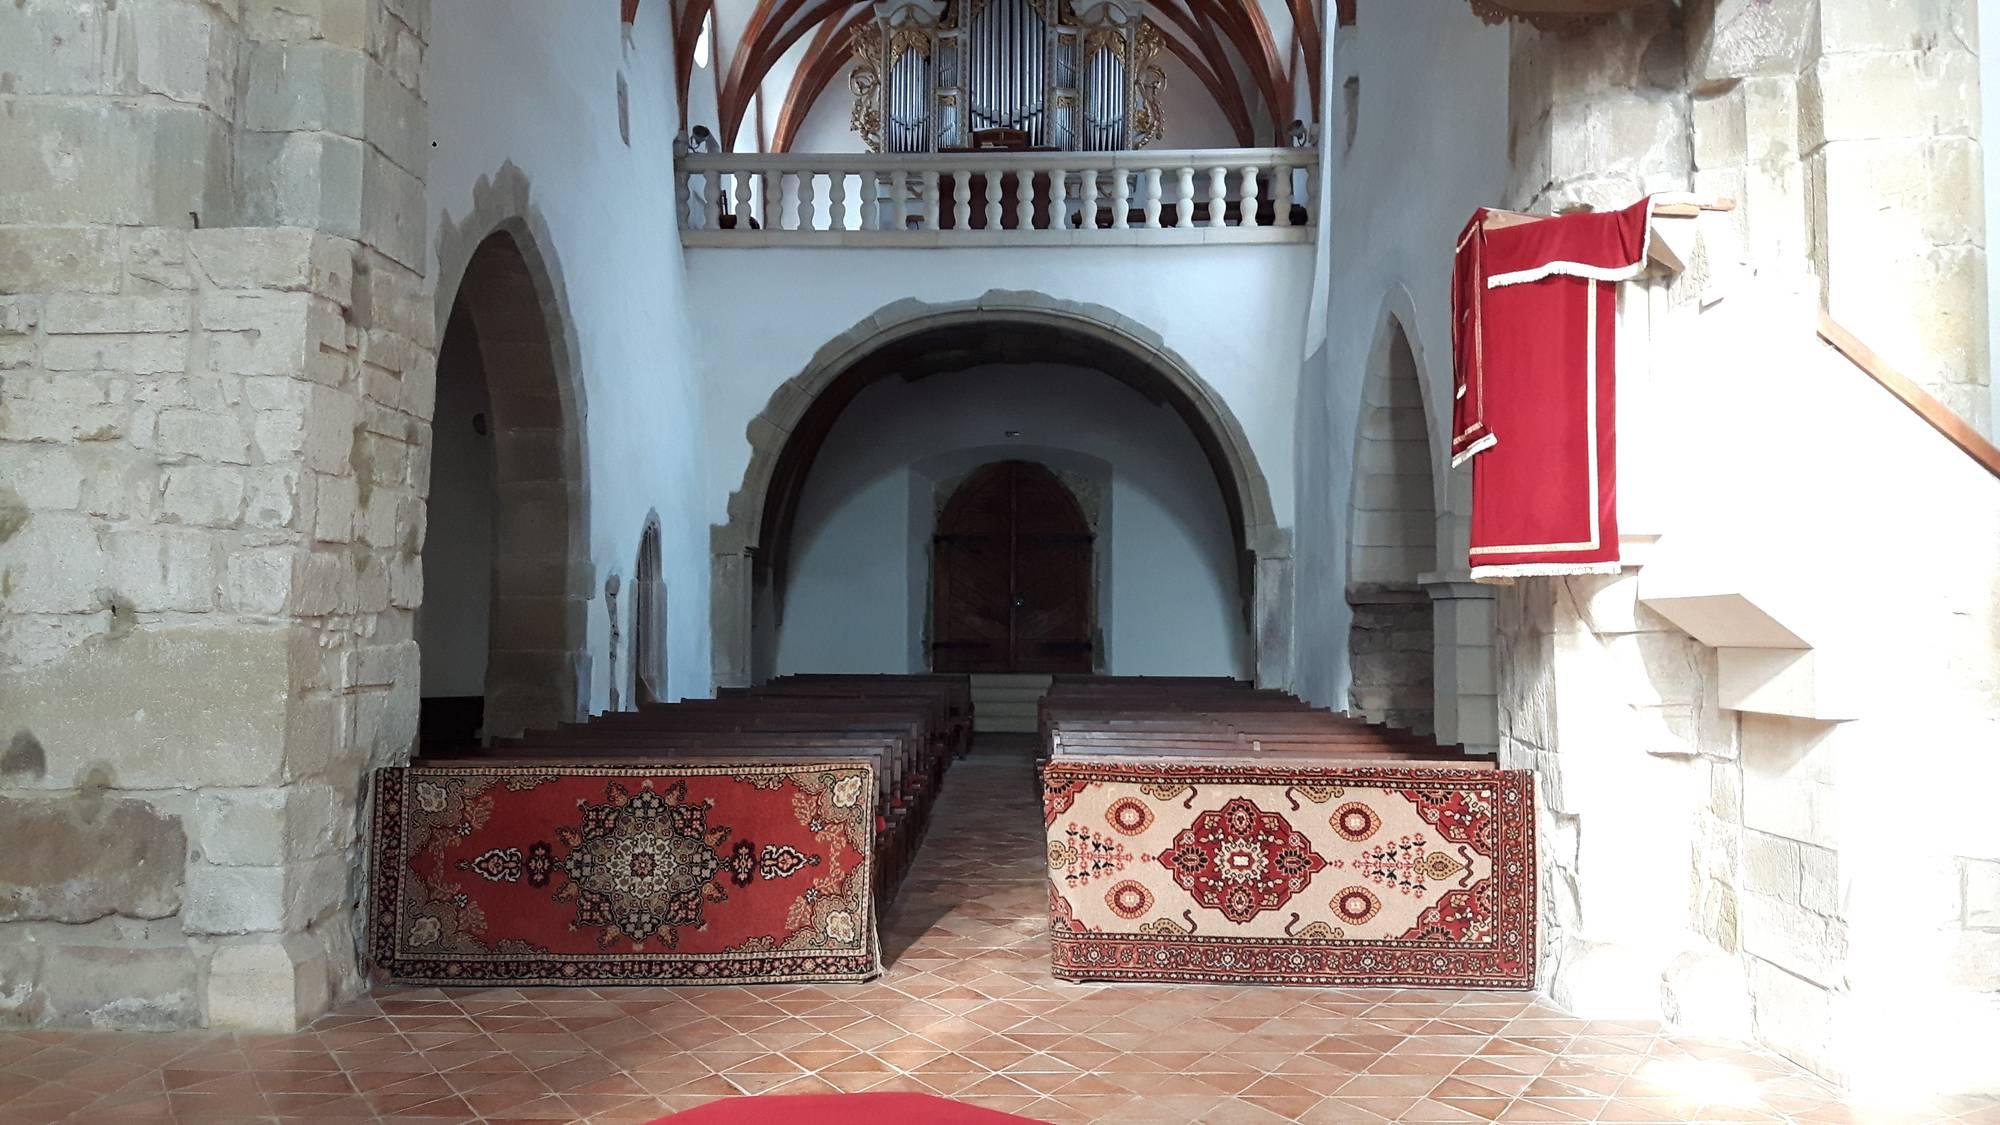 Eglise-fortifiee-Prejmer_07-09-2018_05